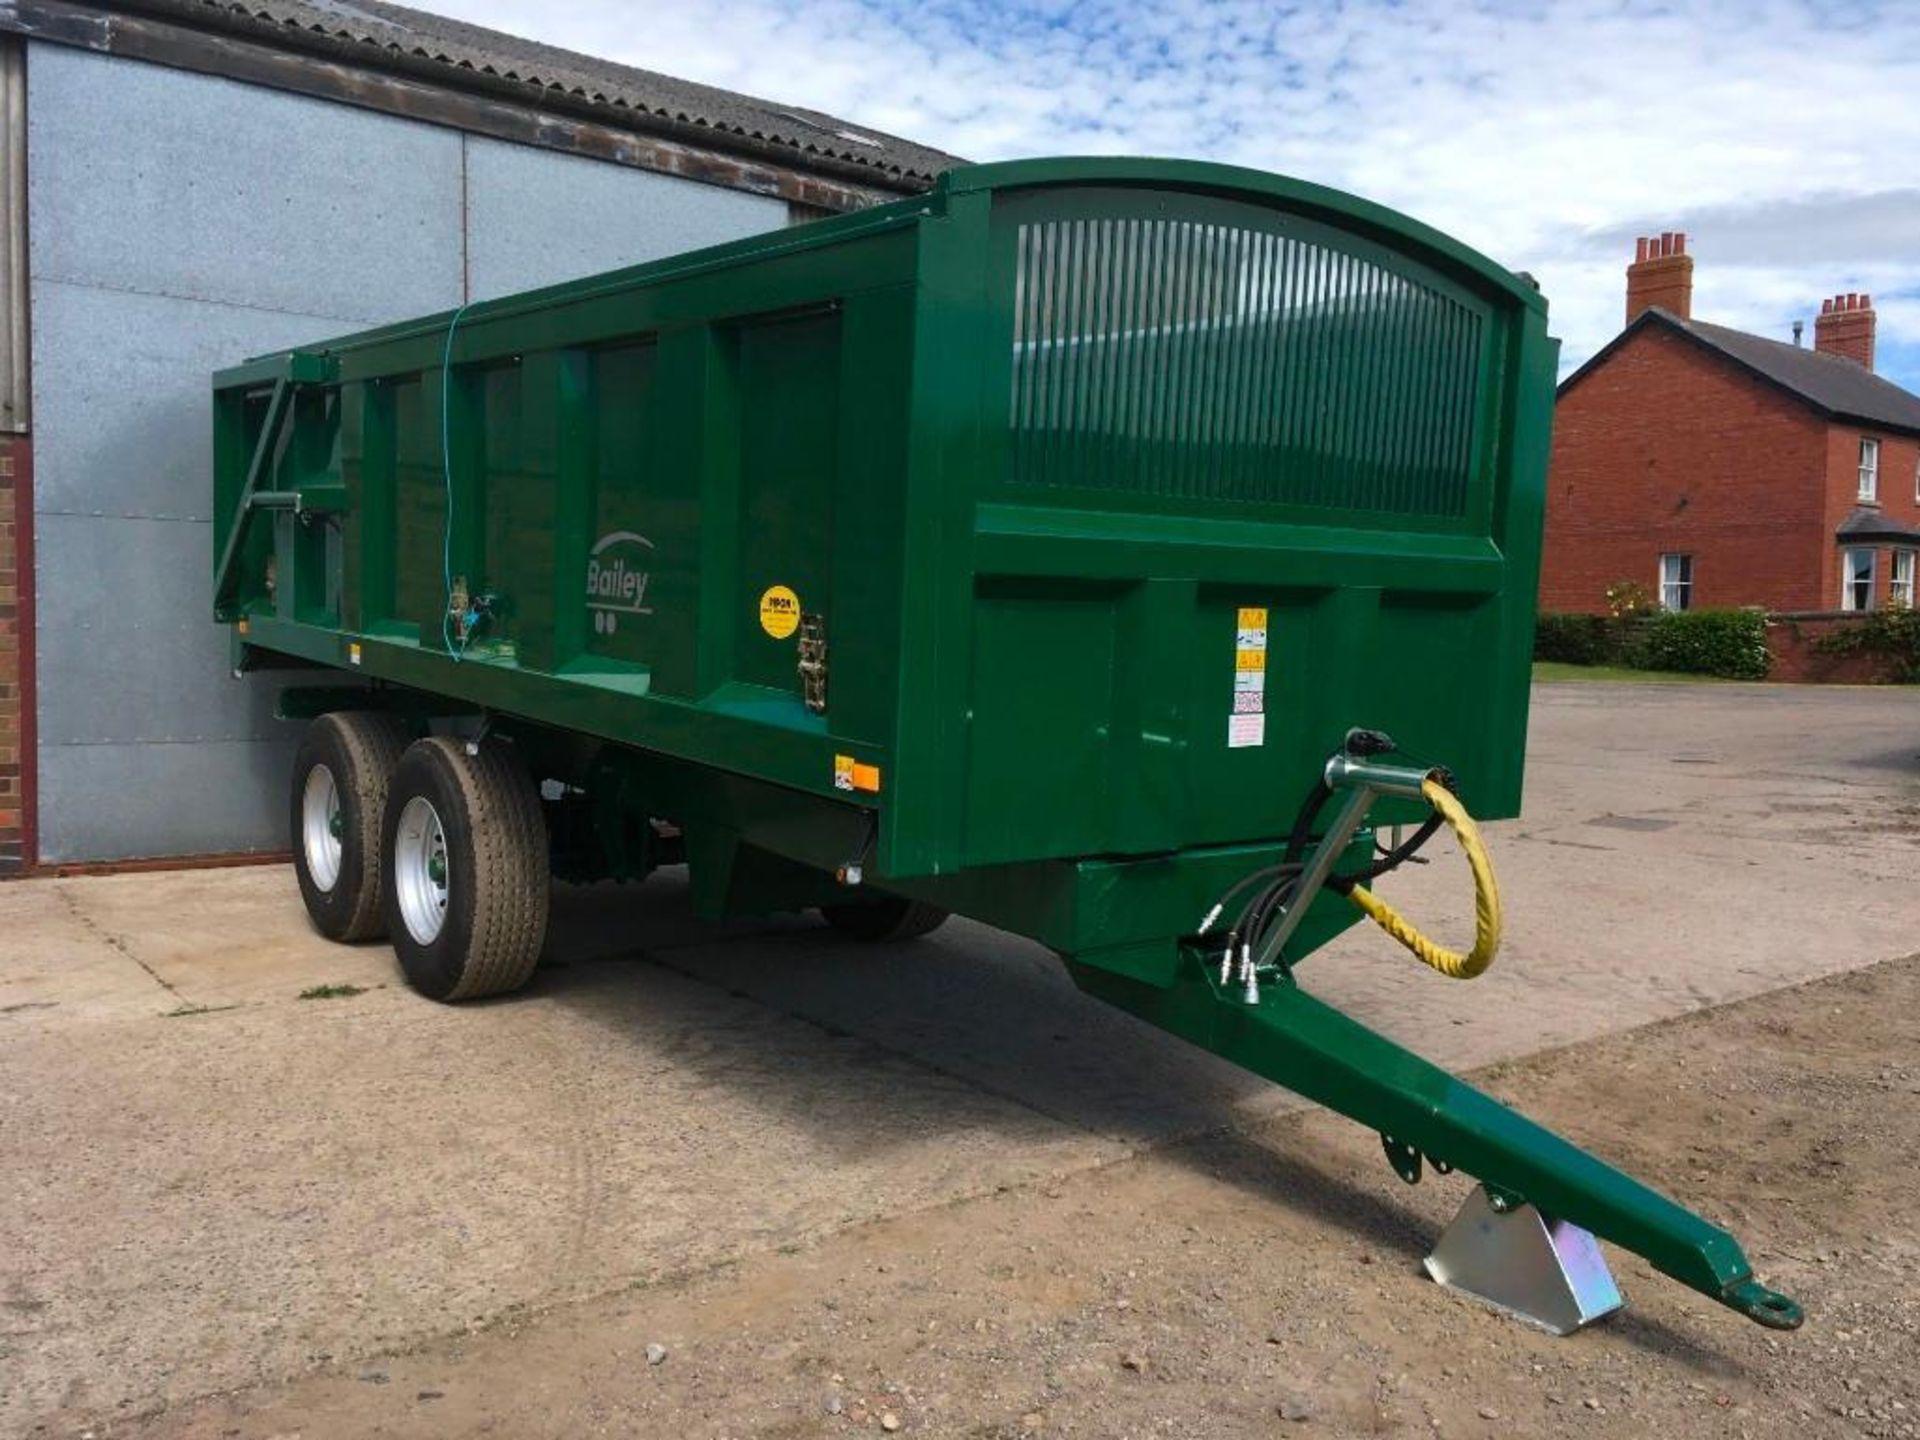 2018 Bailey 14t twin axle trailer, hydraulic back door, manual grain chute, rollover sheet, sprung d - Image 9 of 17